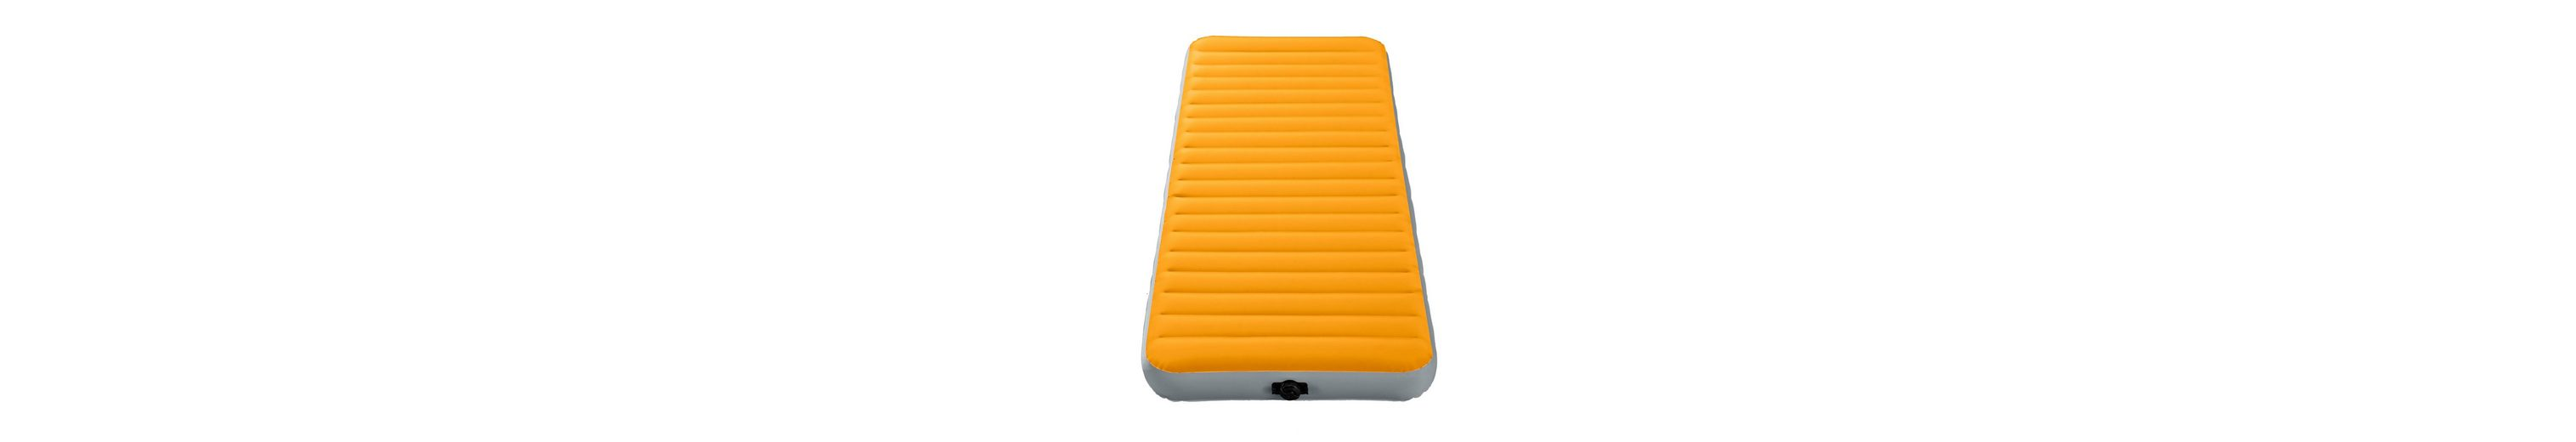 Luftbett, mit integr. Batterieluftpumpe, »Twin Super-Tough Airbed«, Intex